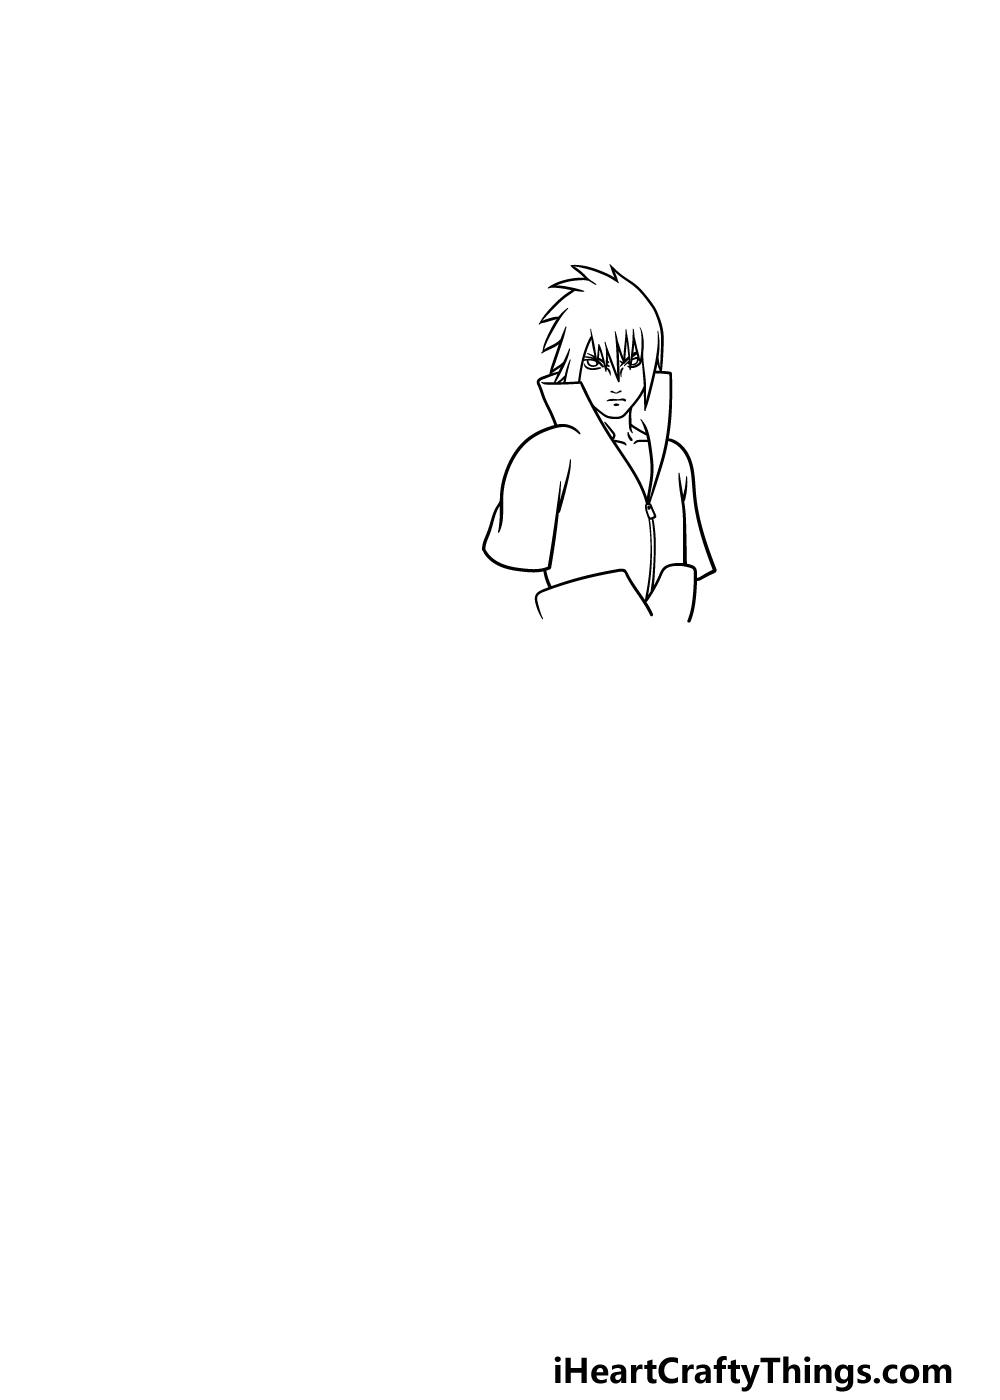 drawing Sasuke step 2